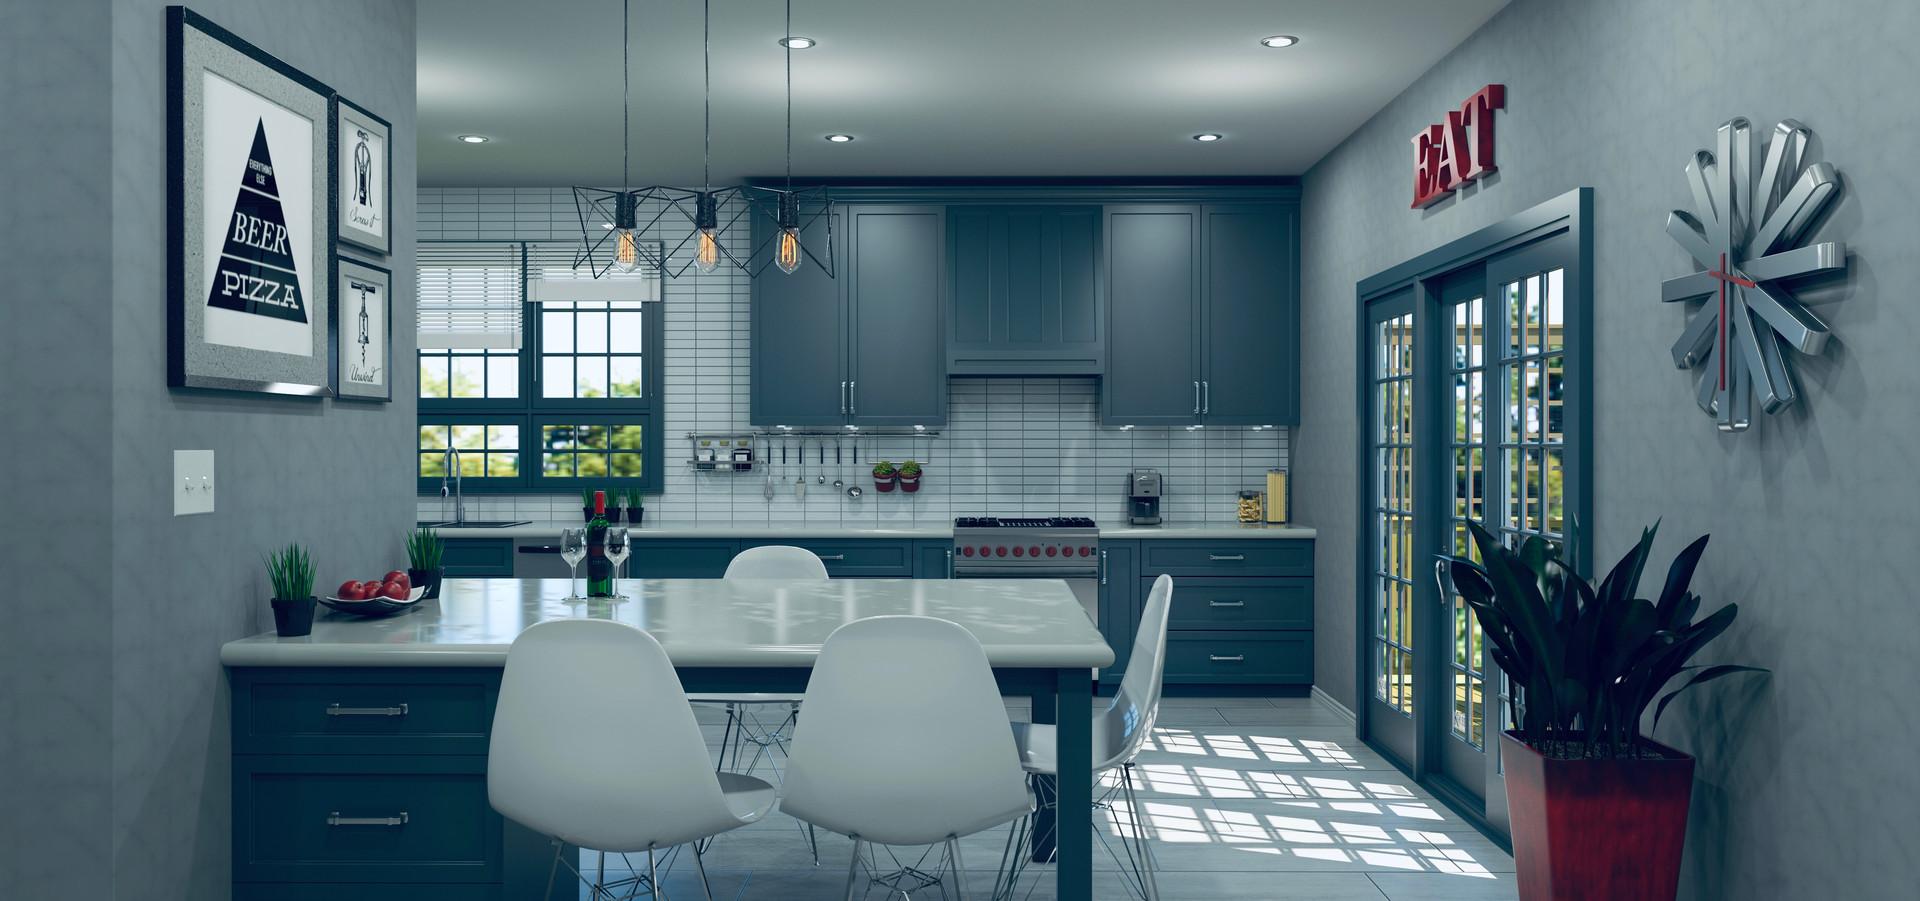 kitchen_PP - Copy.jpg